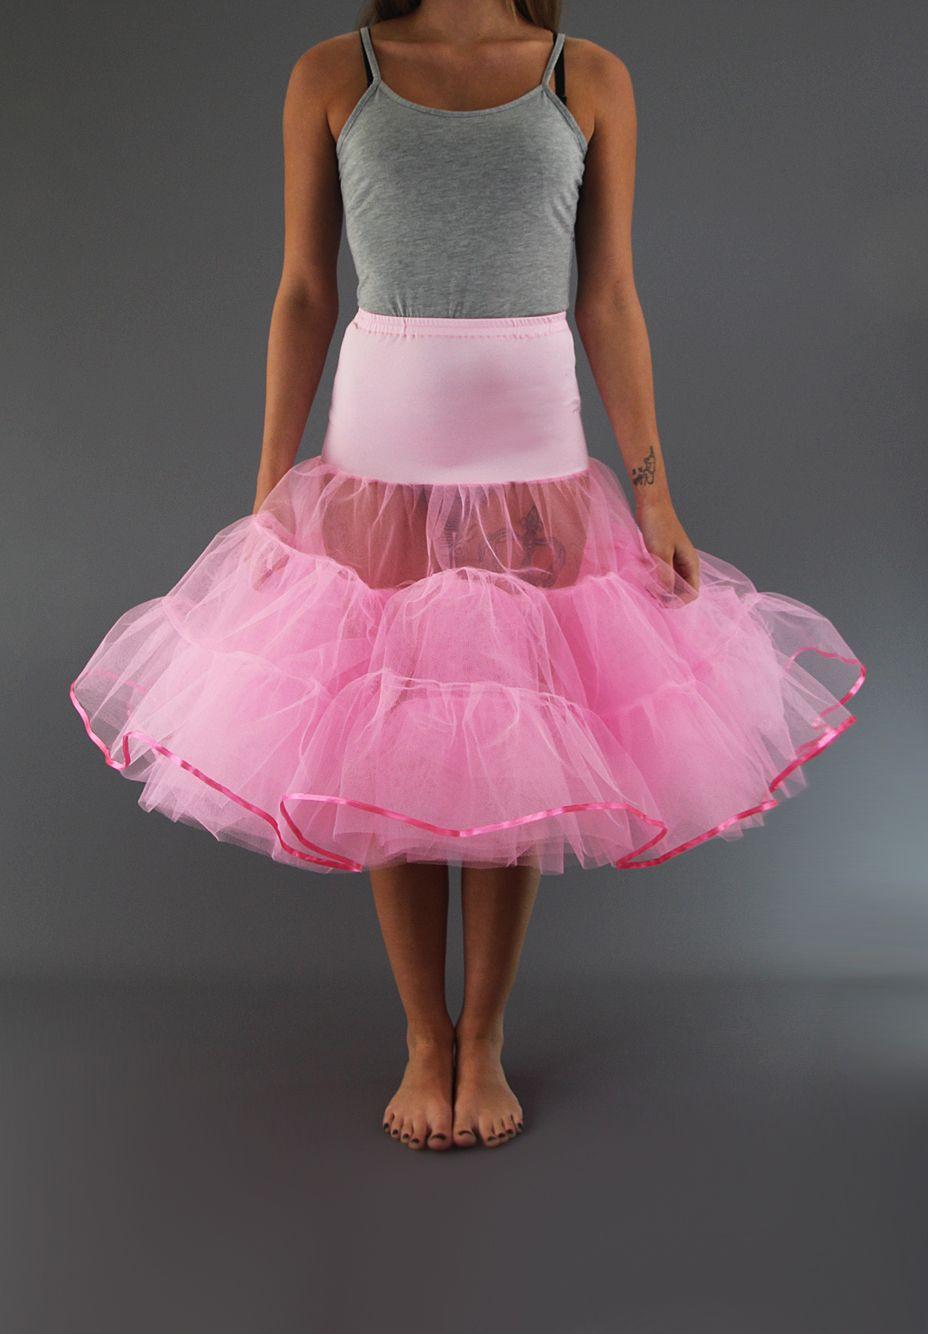 Rockabilly Tiered Petticoat